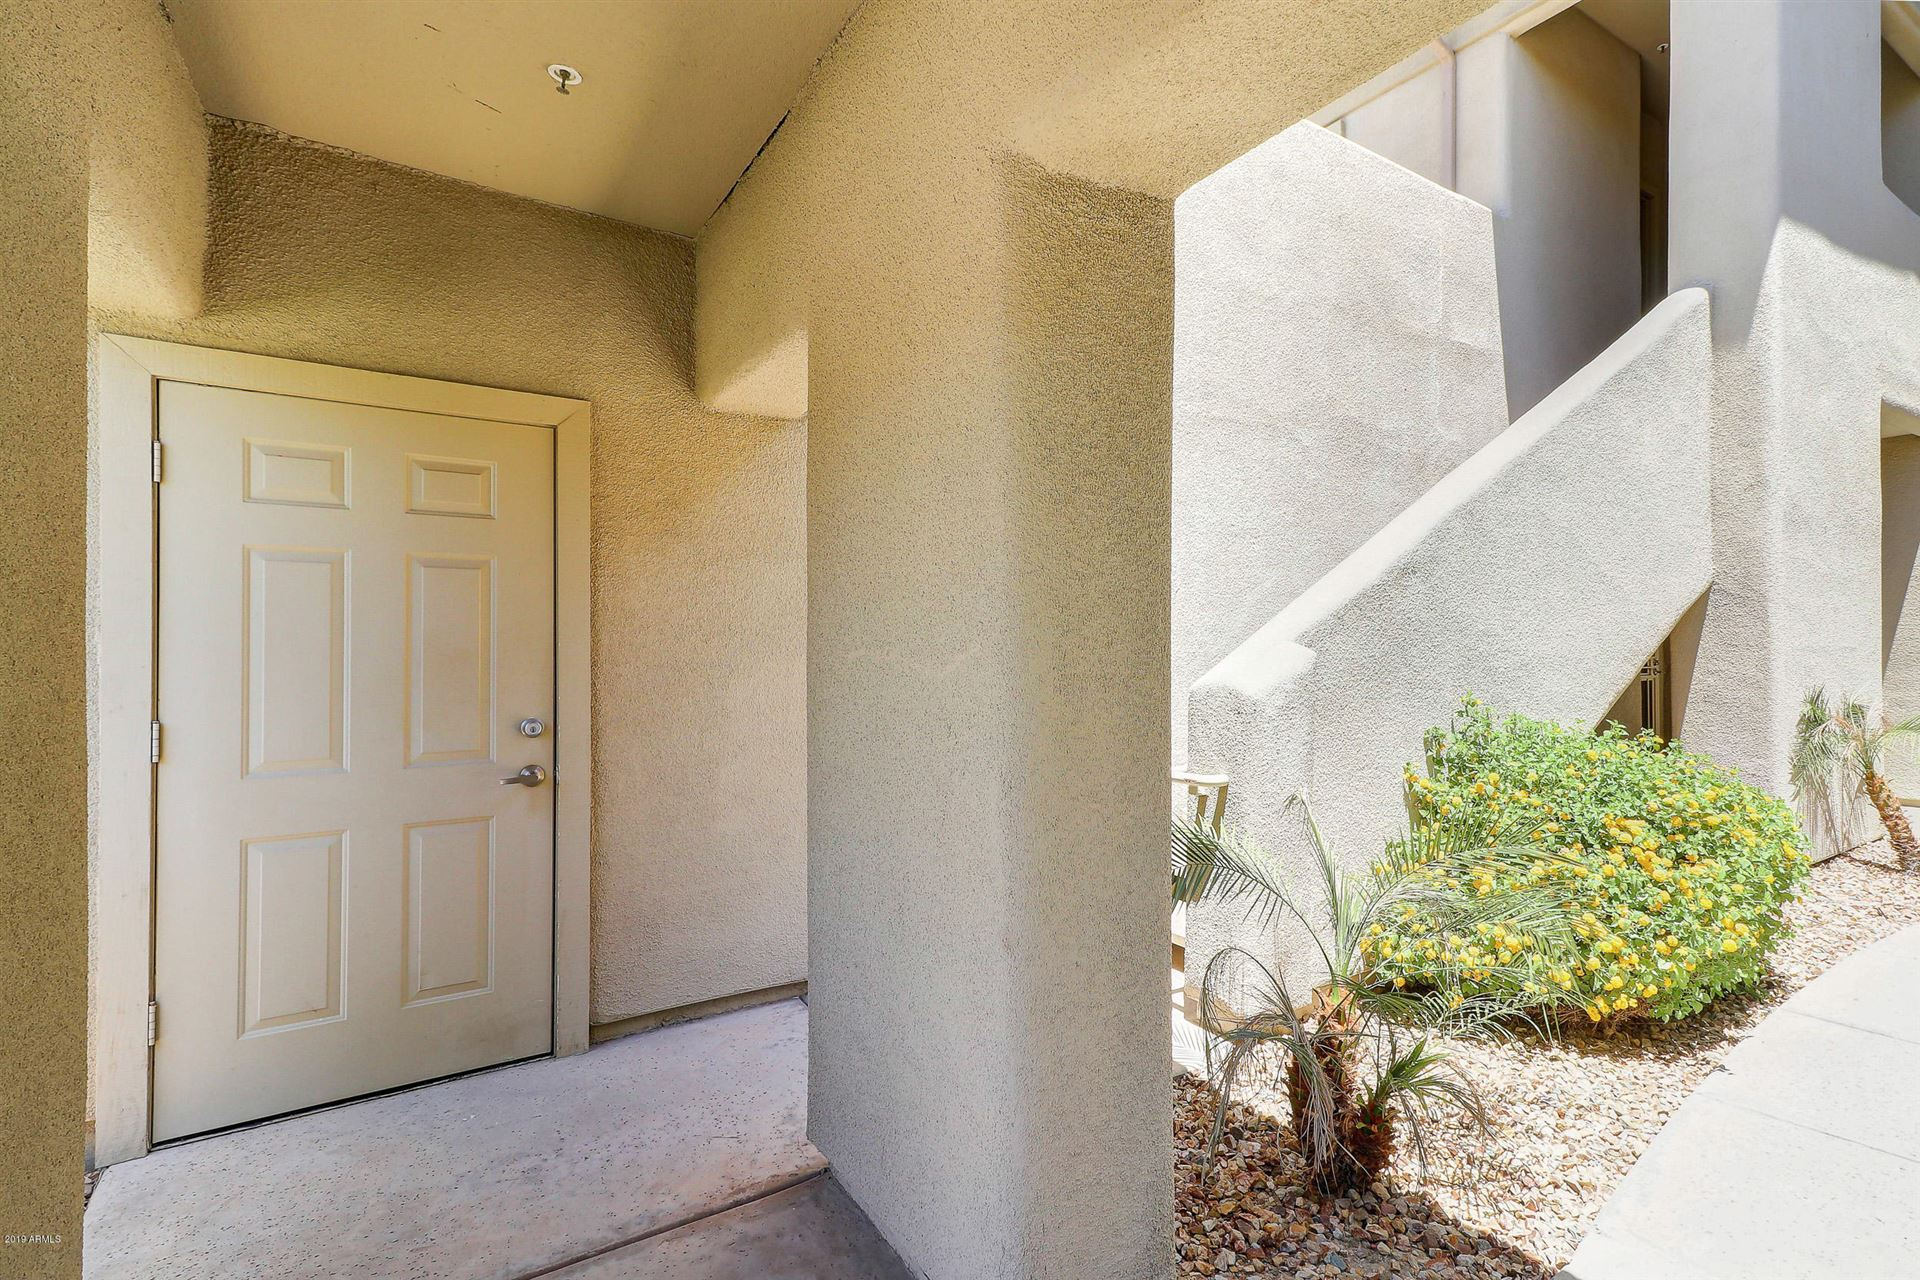 Photo of 7401 W ARROWHEAD CLUBHOUSE Drive #2078, Glendale, AZ 85308 (MLS # 6220206)